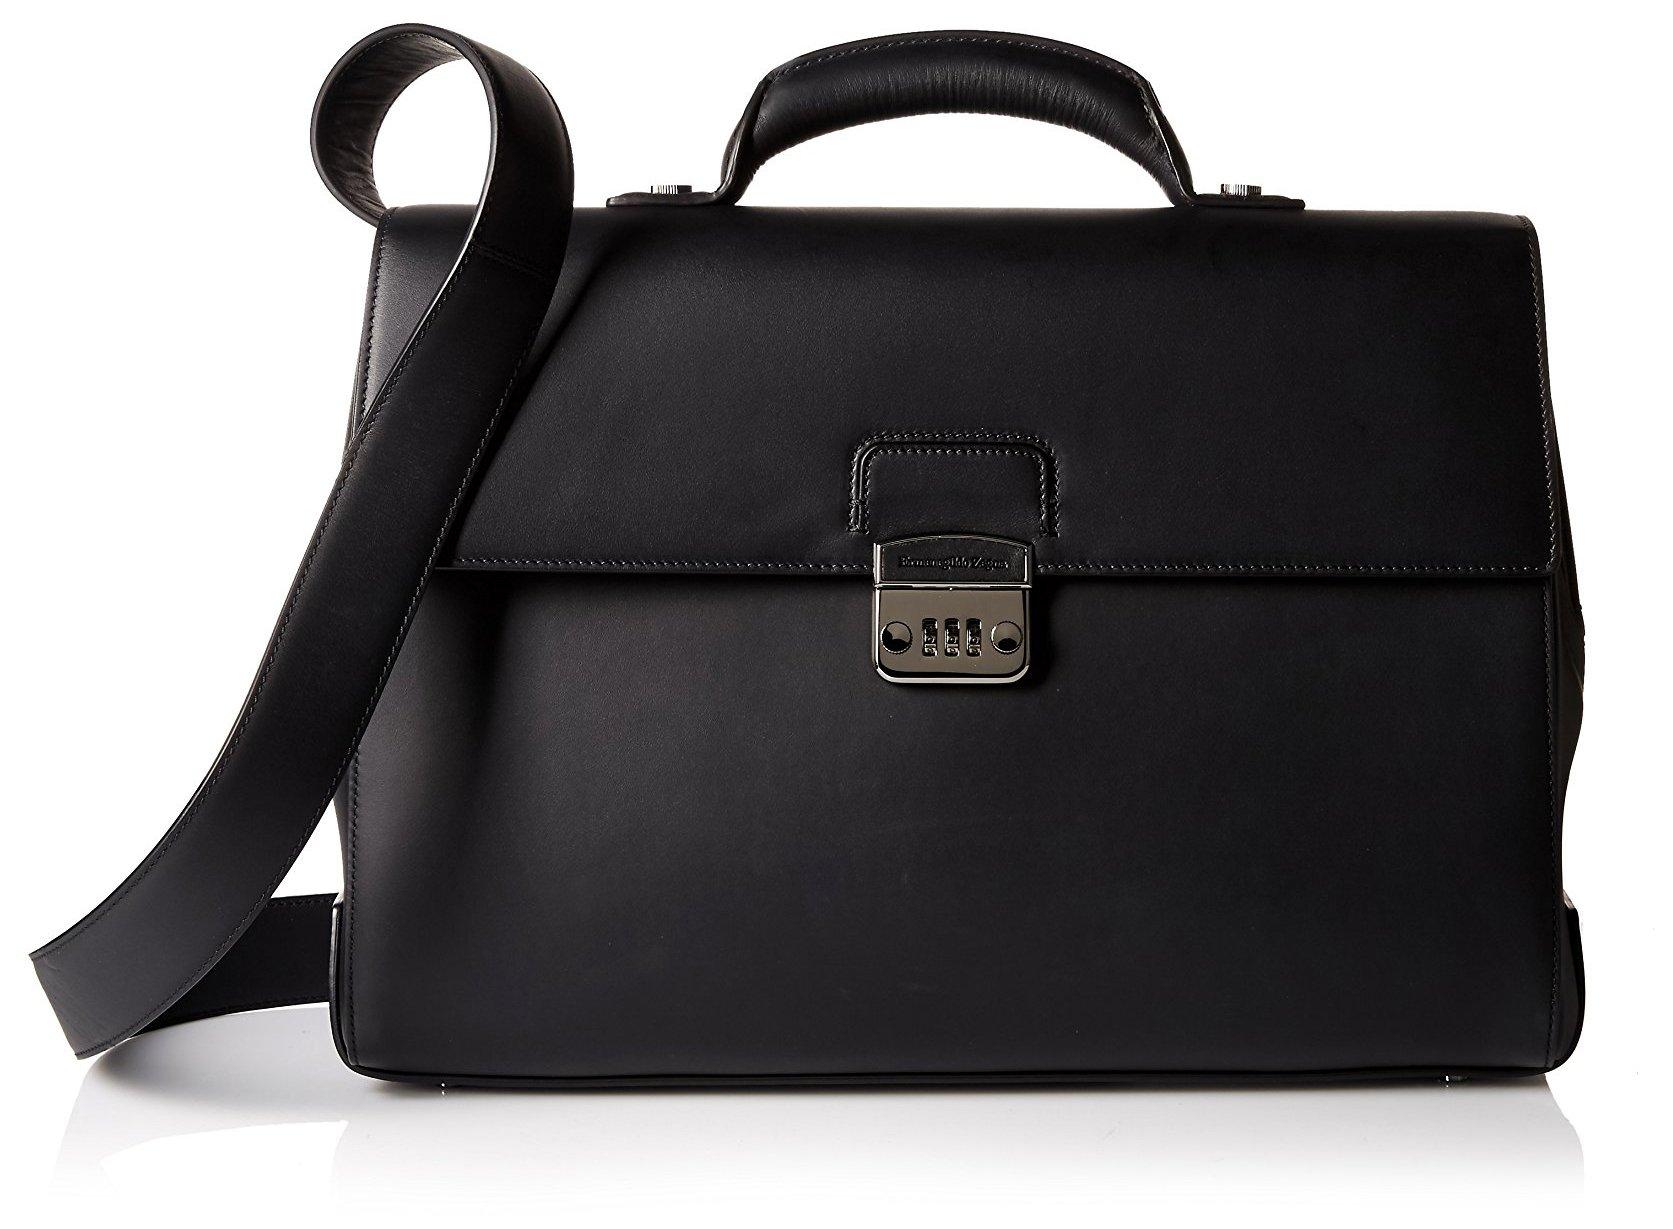 Ermenegildo Zegna Men's Briefcase Bag, Nero